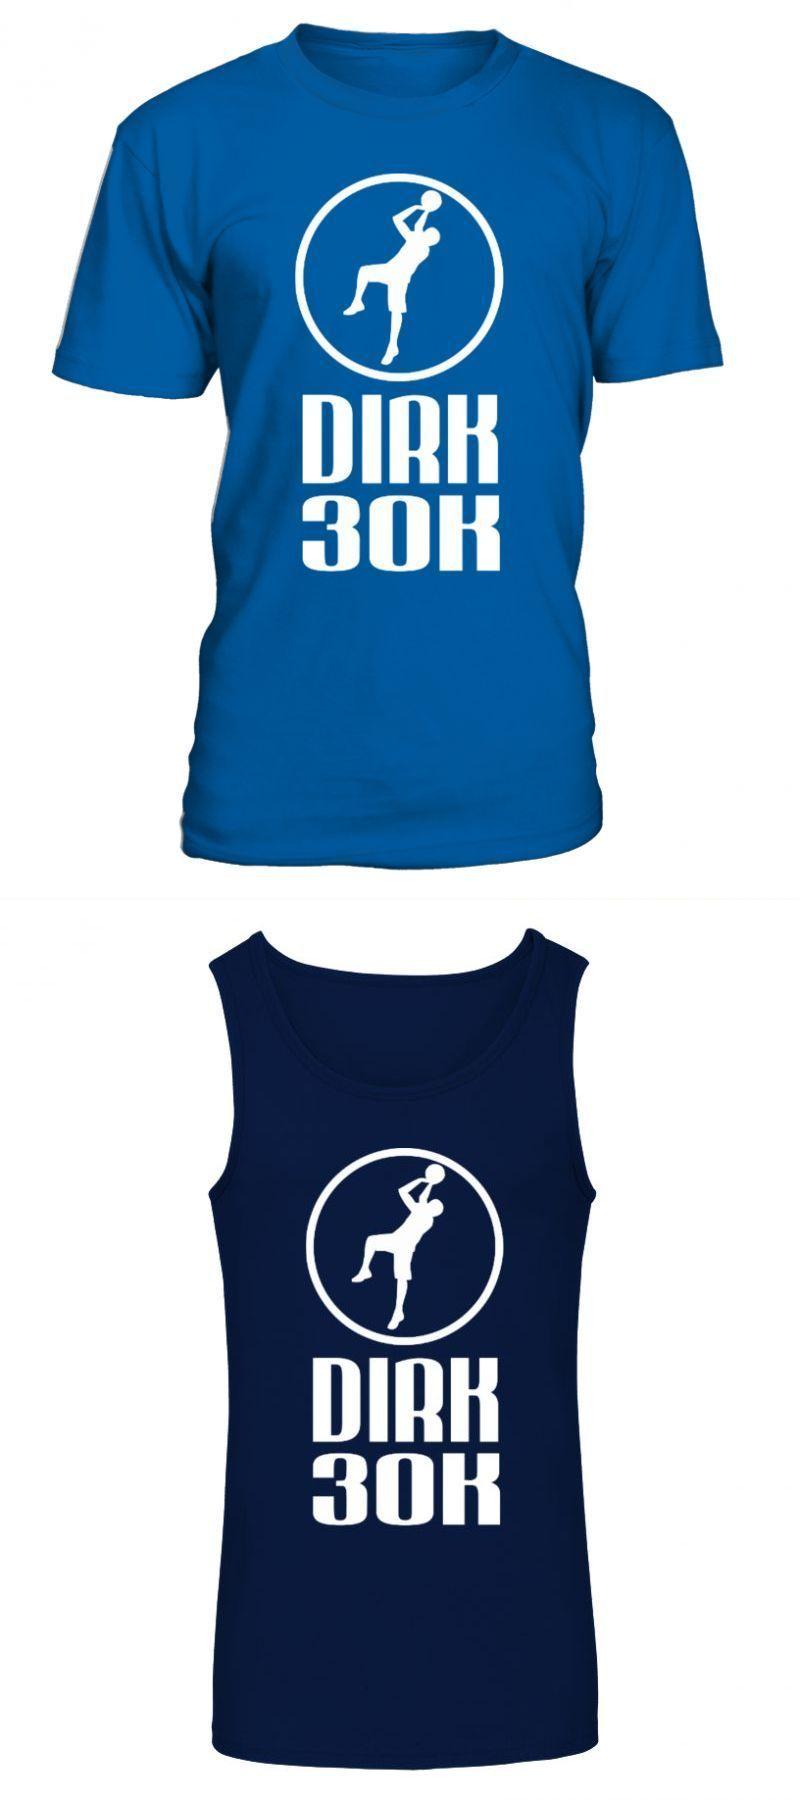 f5ce6e363 Dirk 30k - get your dirk nowitzki t-shirt now! thunder basketball t shirt   dirk  30k  get  your  nowitzki  t-shirt  now!  thunder  basketball  shirt   design ...